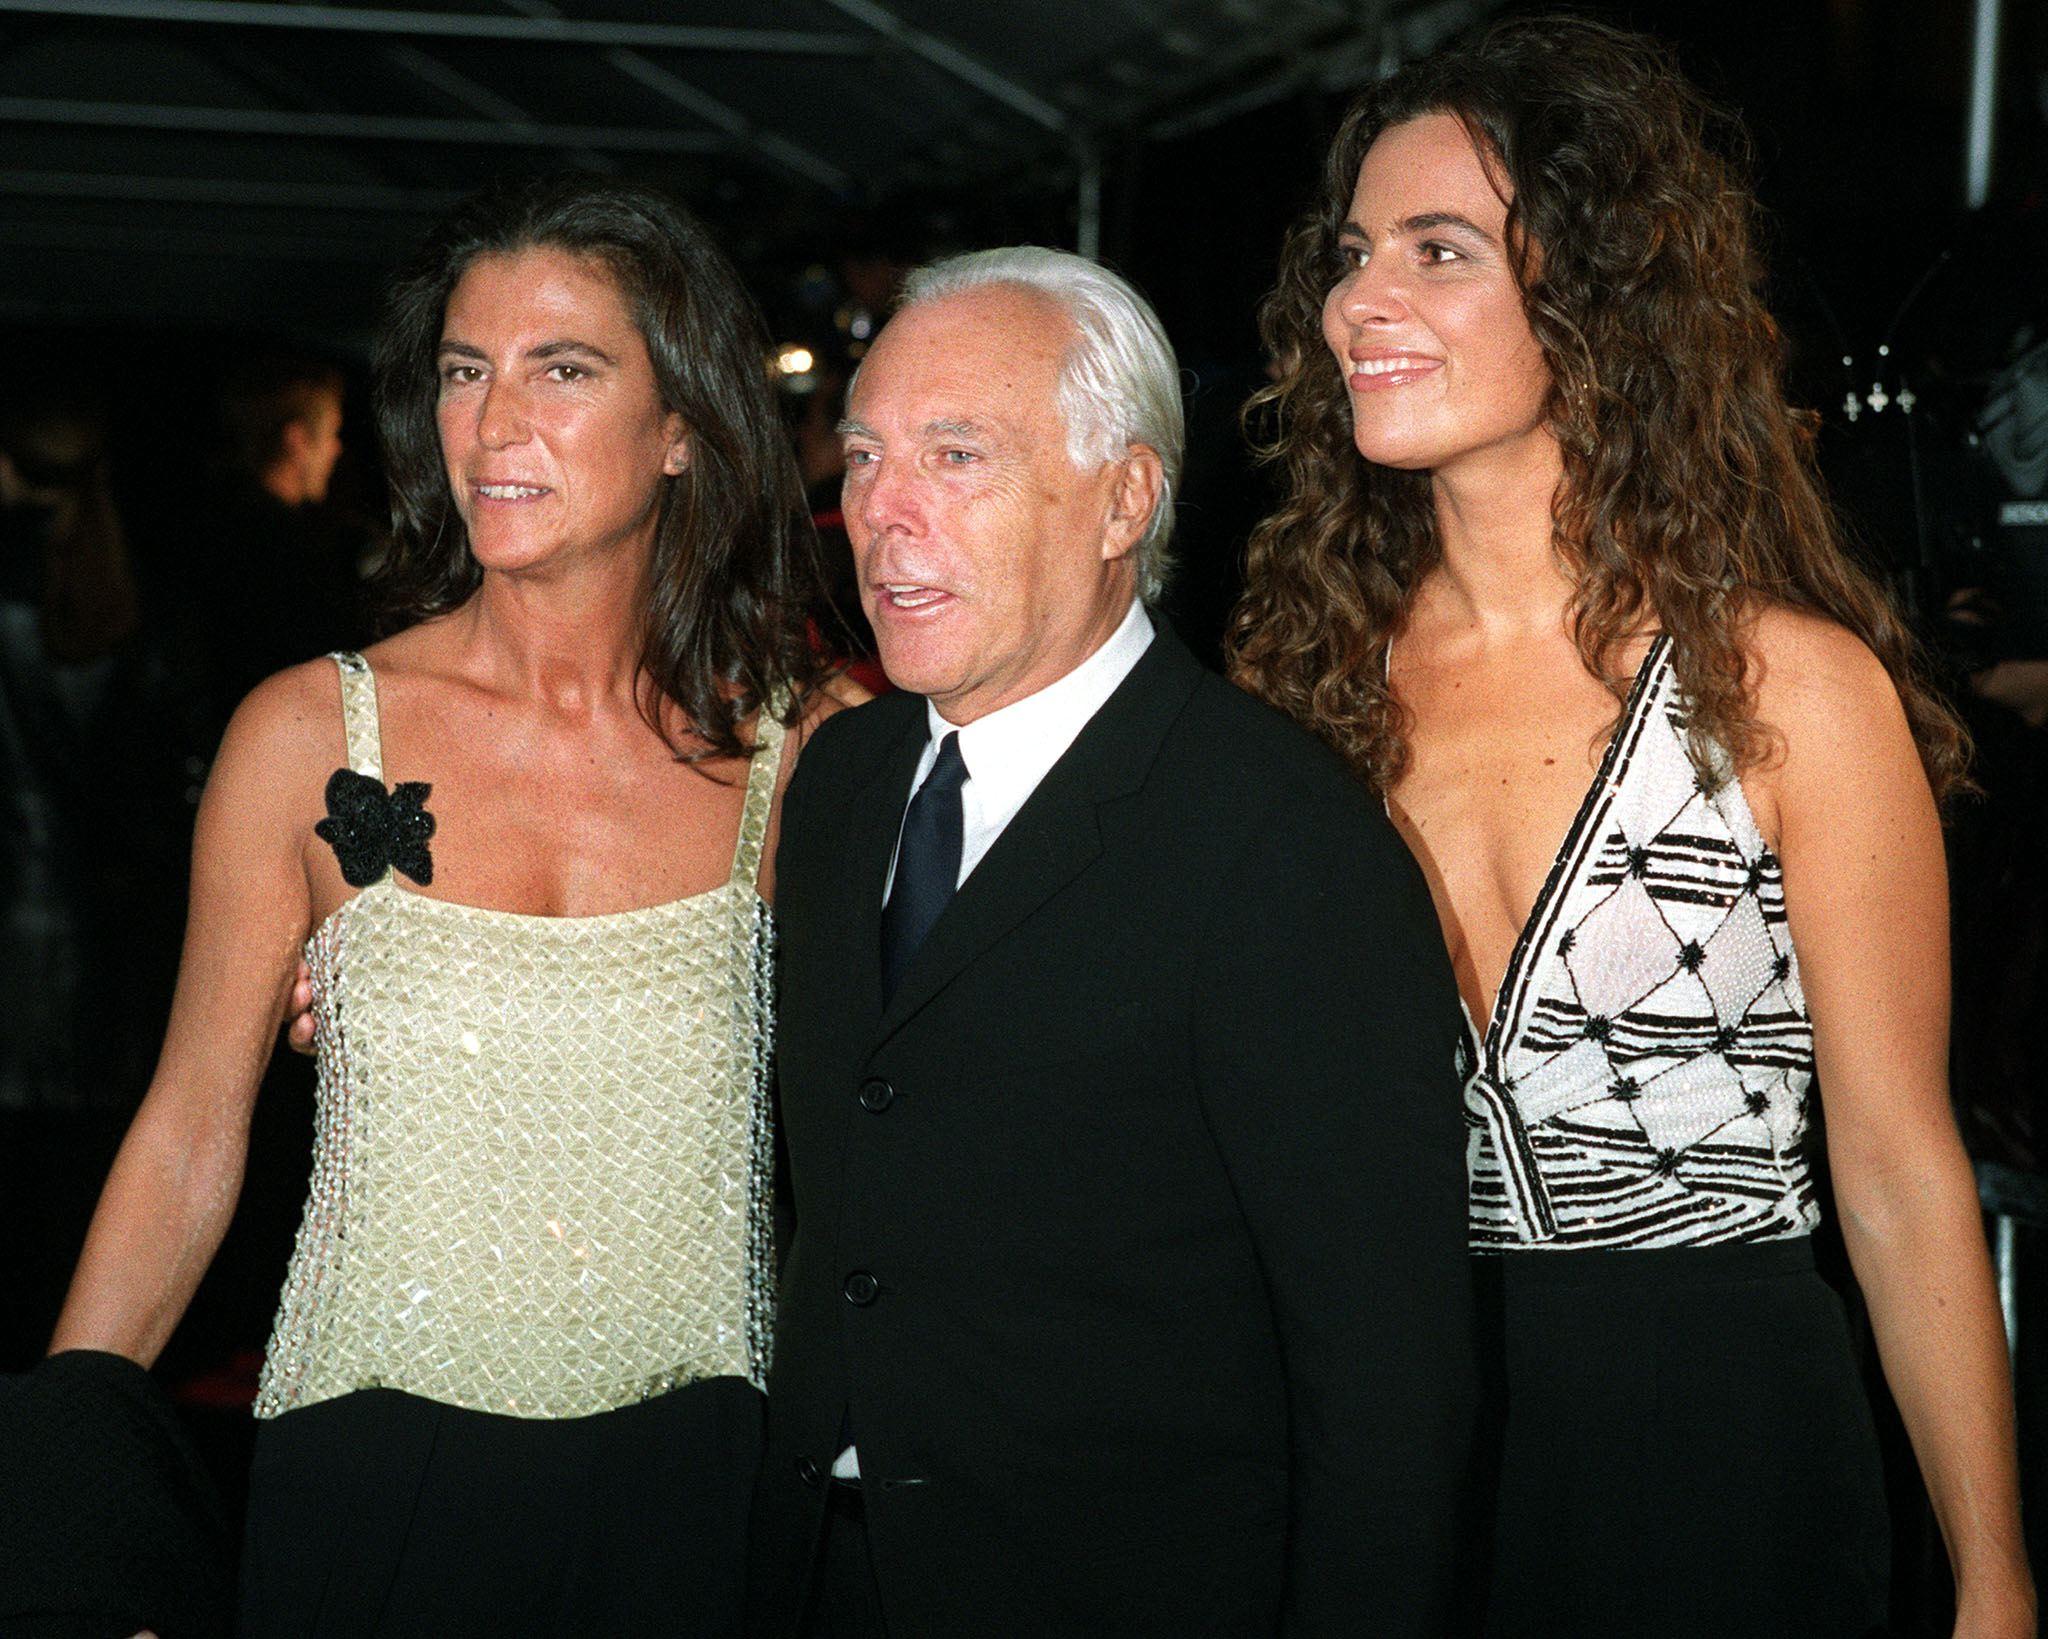 Giorgio Armani is one of the richest fashion designers in the world